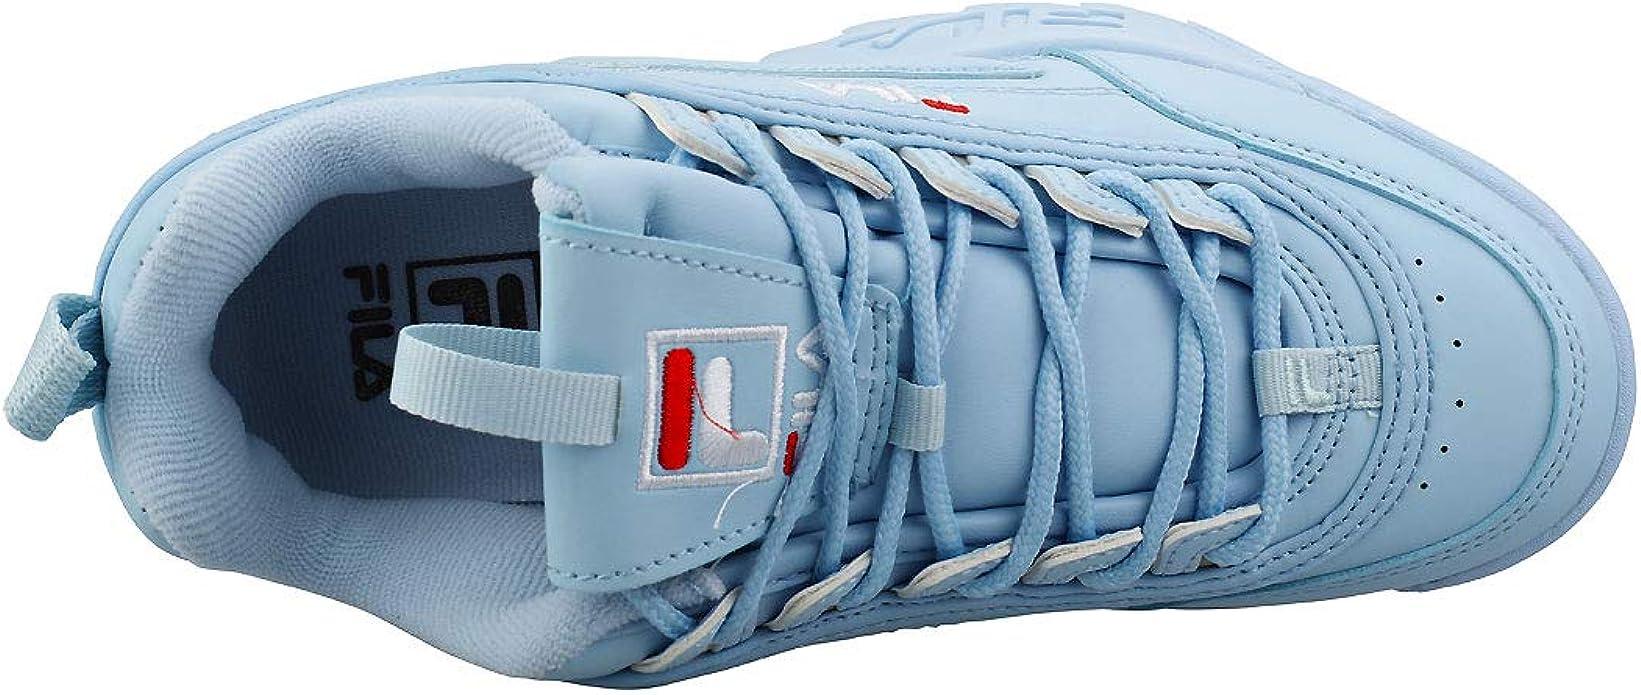 Fila Leather Disruptor Ii Premium Womens Angel Falls Blue